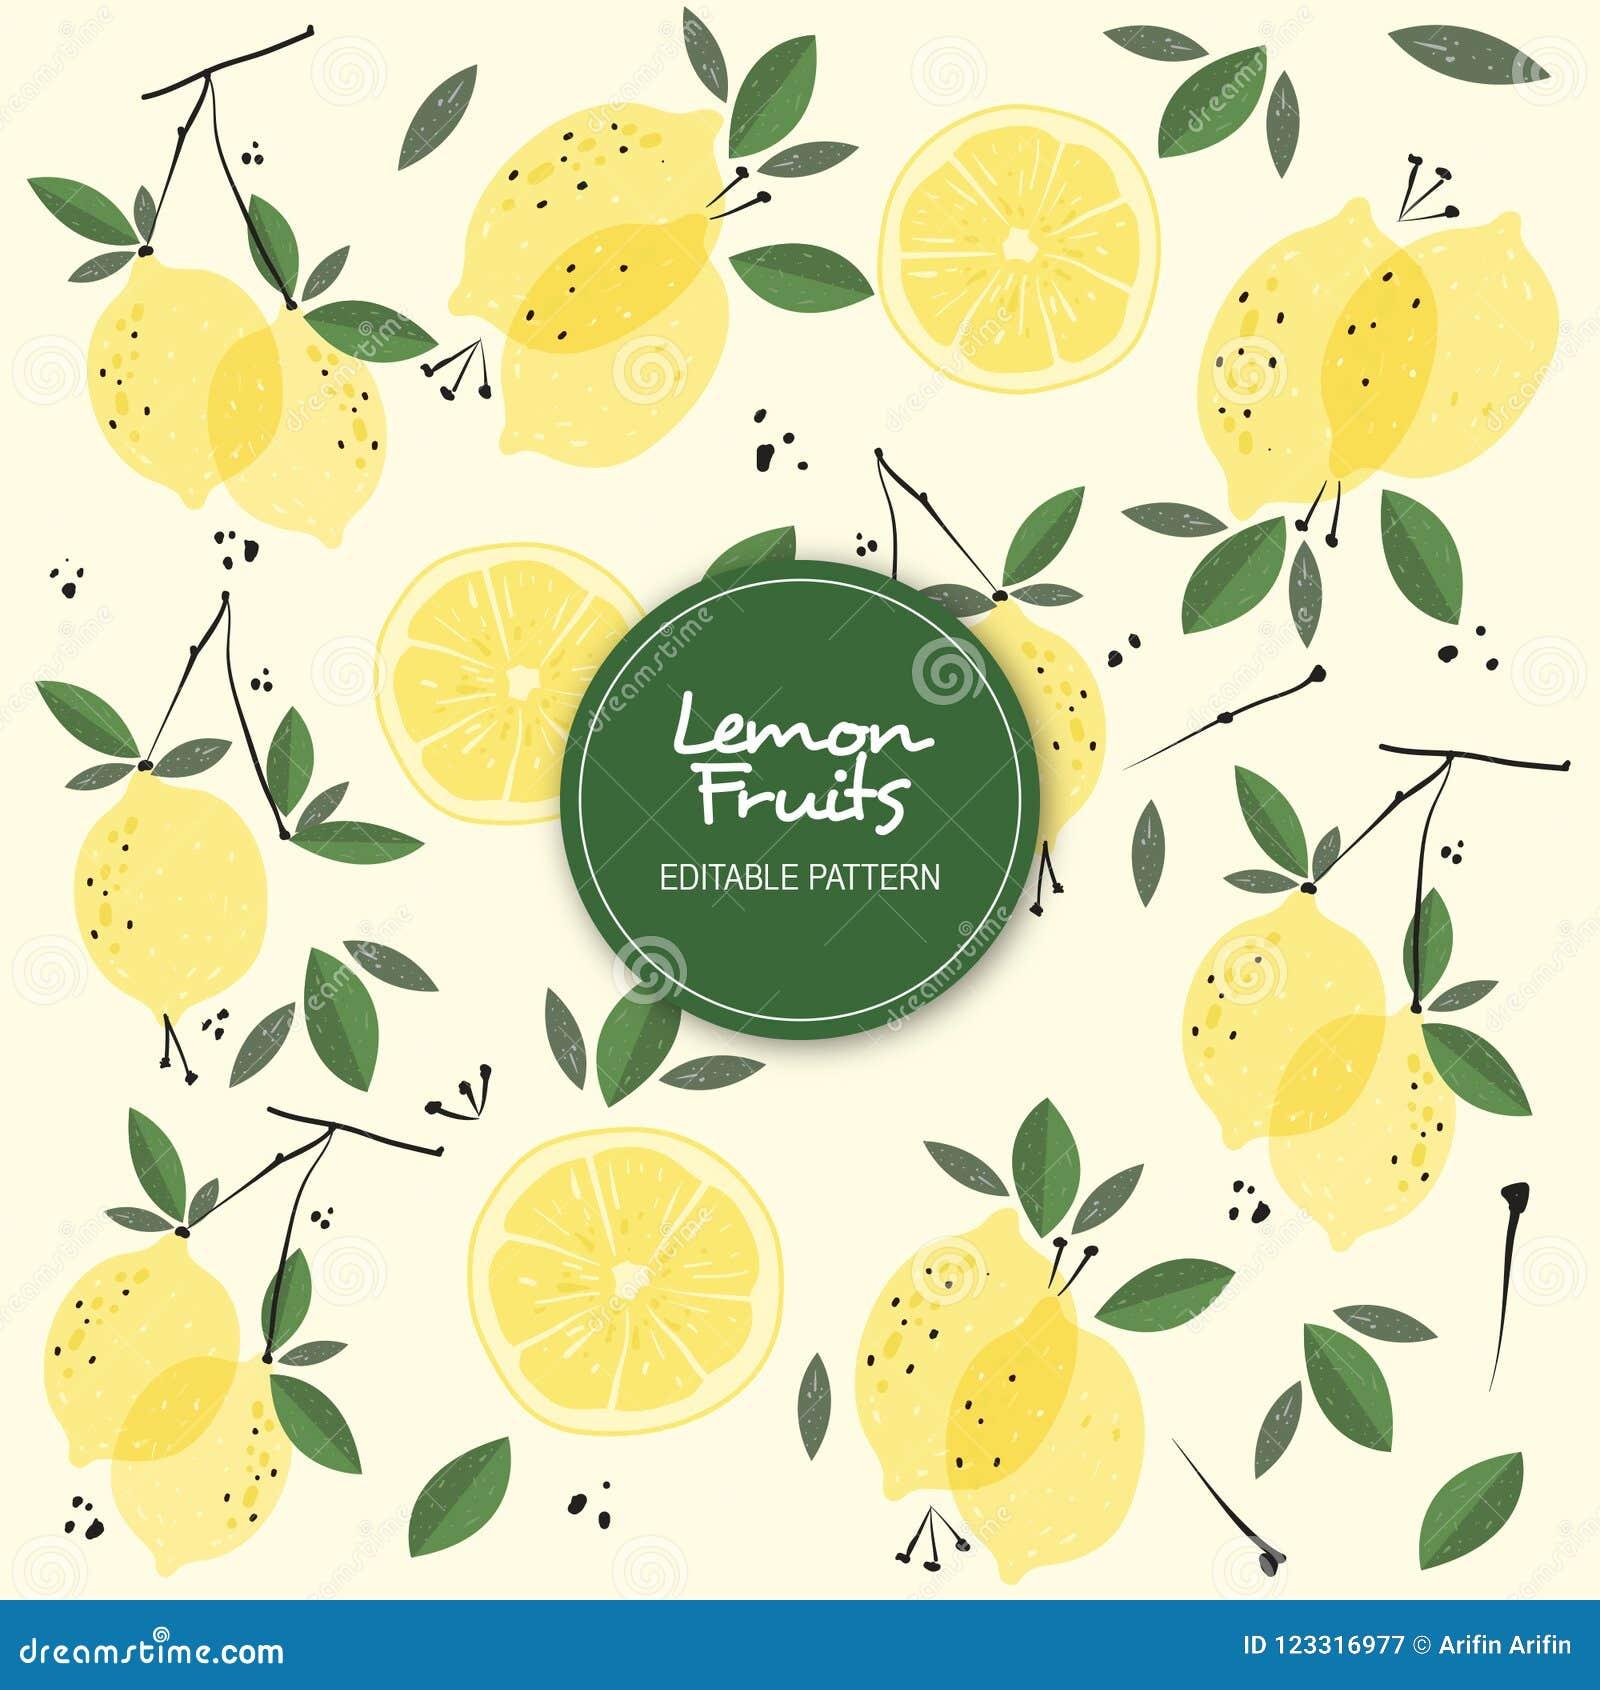 lemon fruits editable background pattern stock illustration